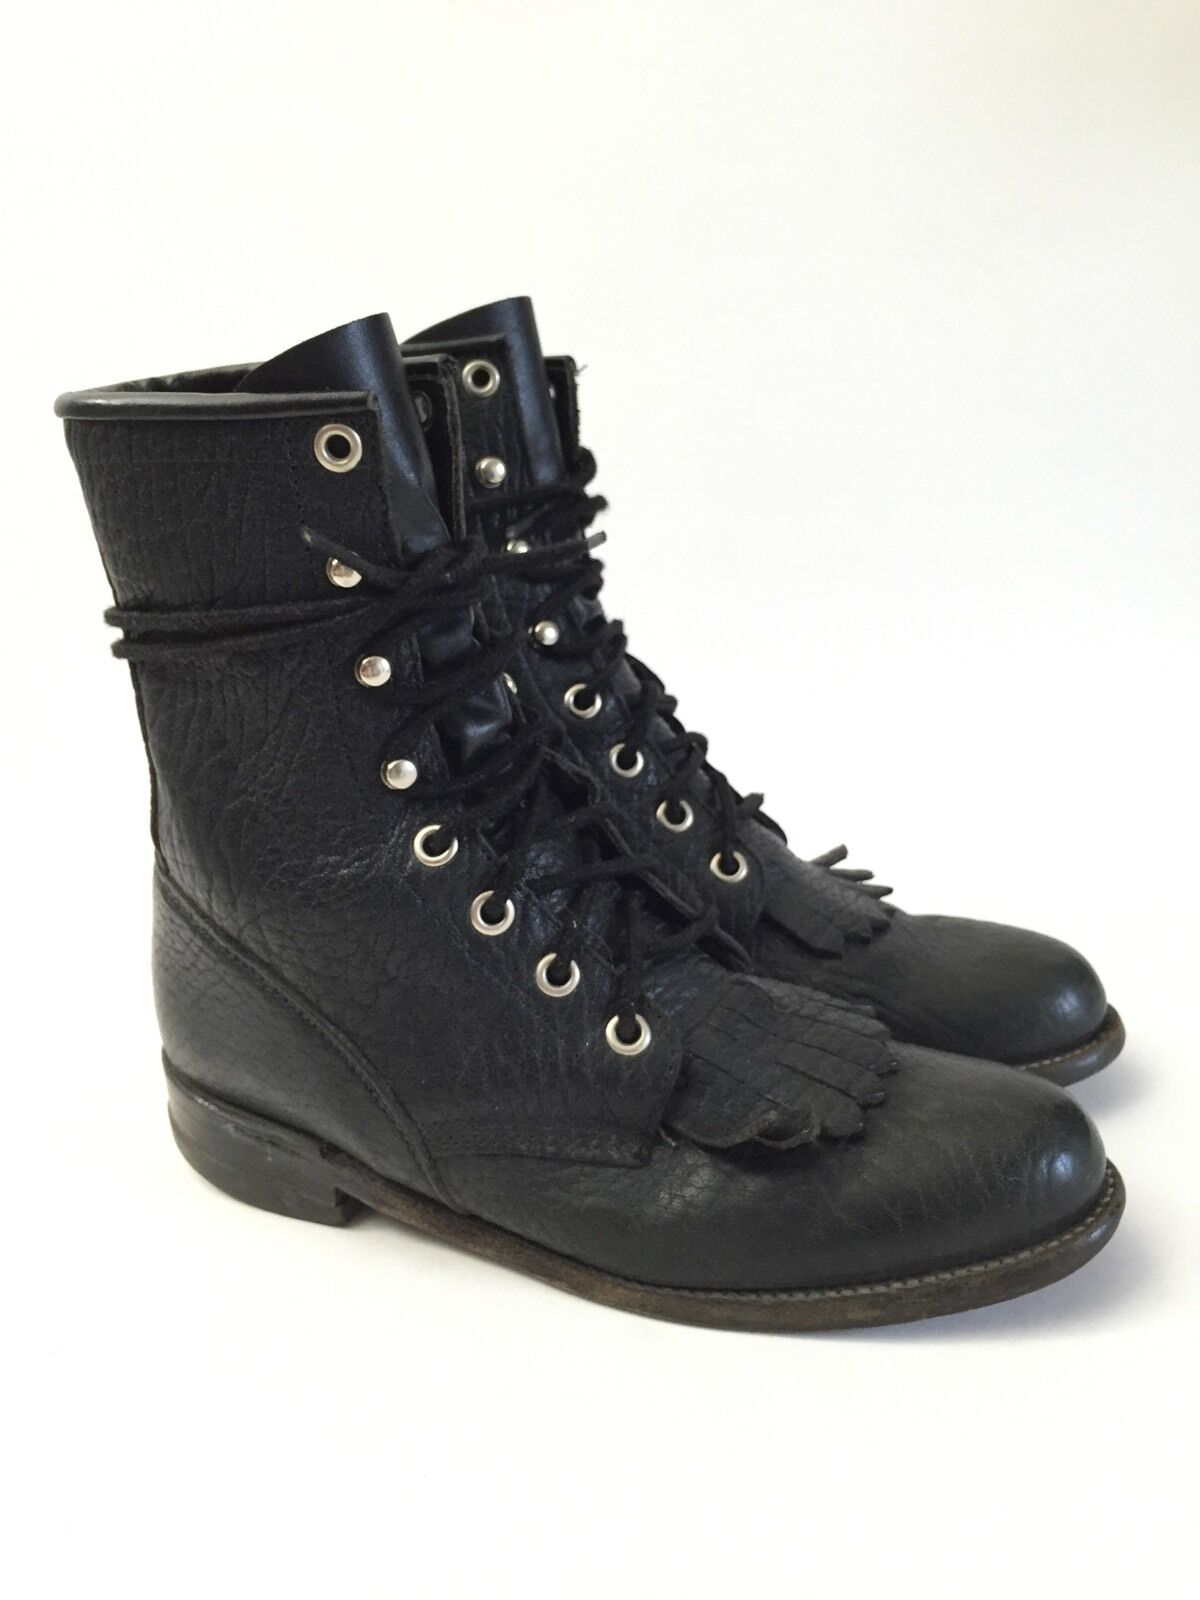 JUSTIN (4.5) BLACK Cowboy Western Boots Women's Sz 4.5 B * USA